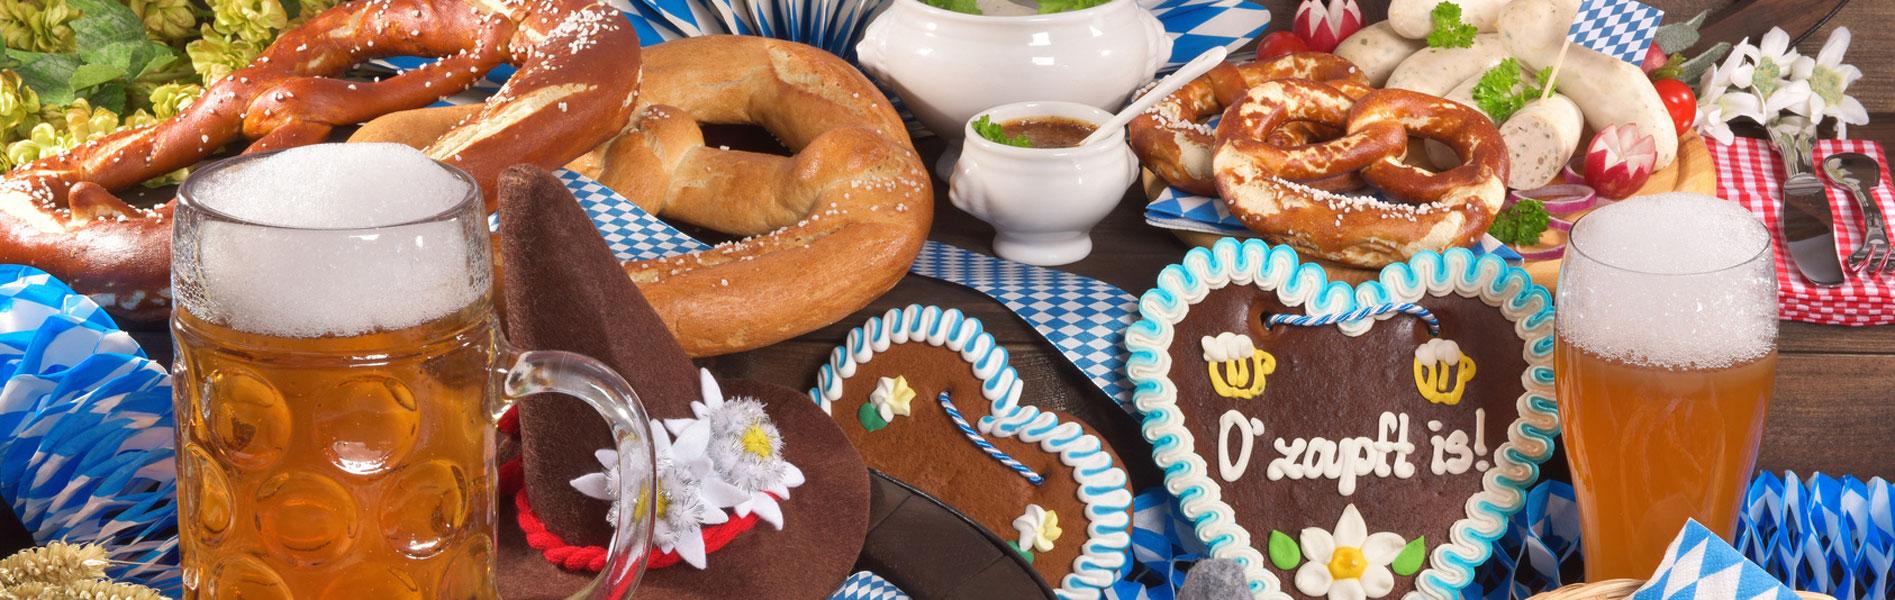 Bayerisches Buffet München - Unikorn Catering & Events